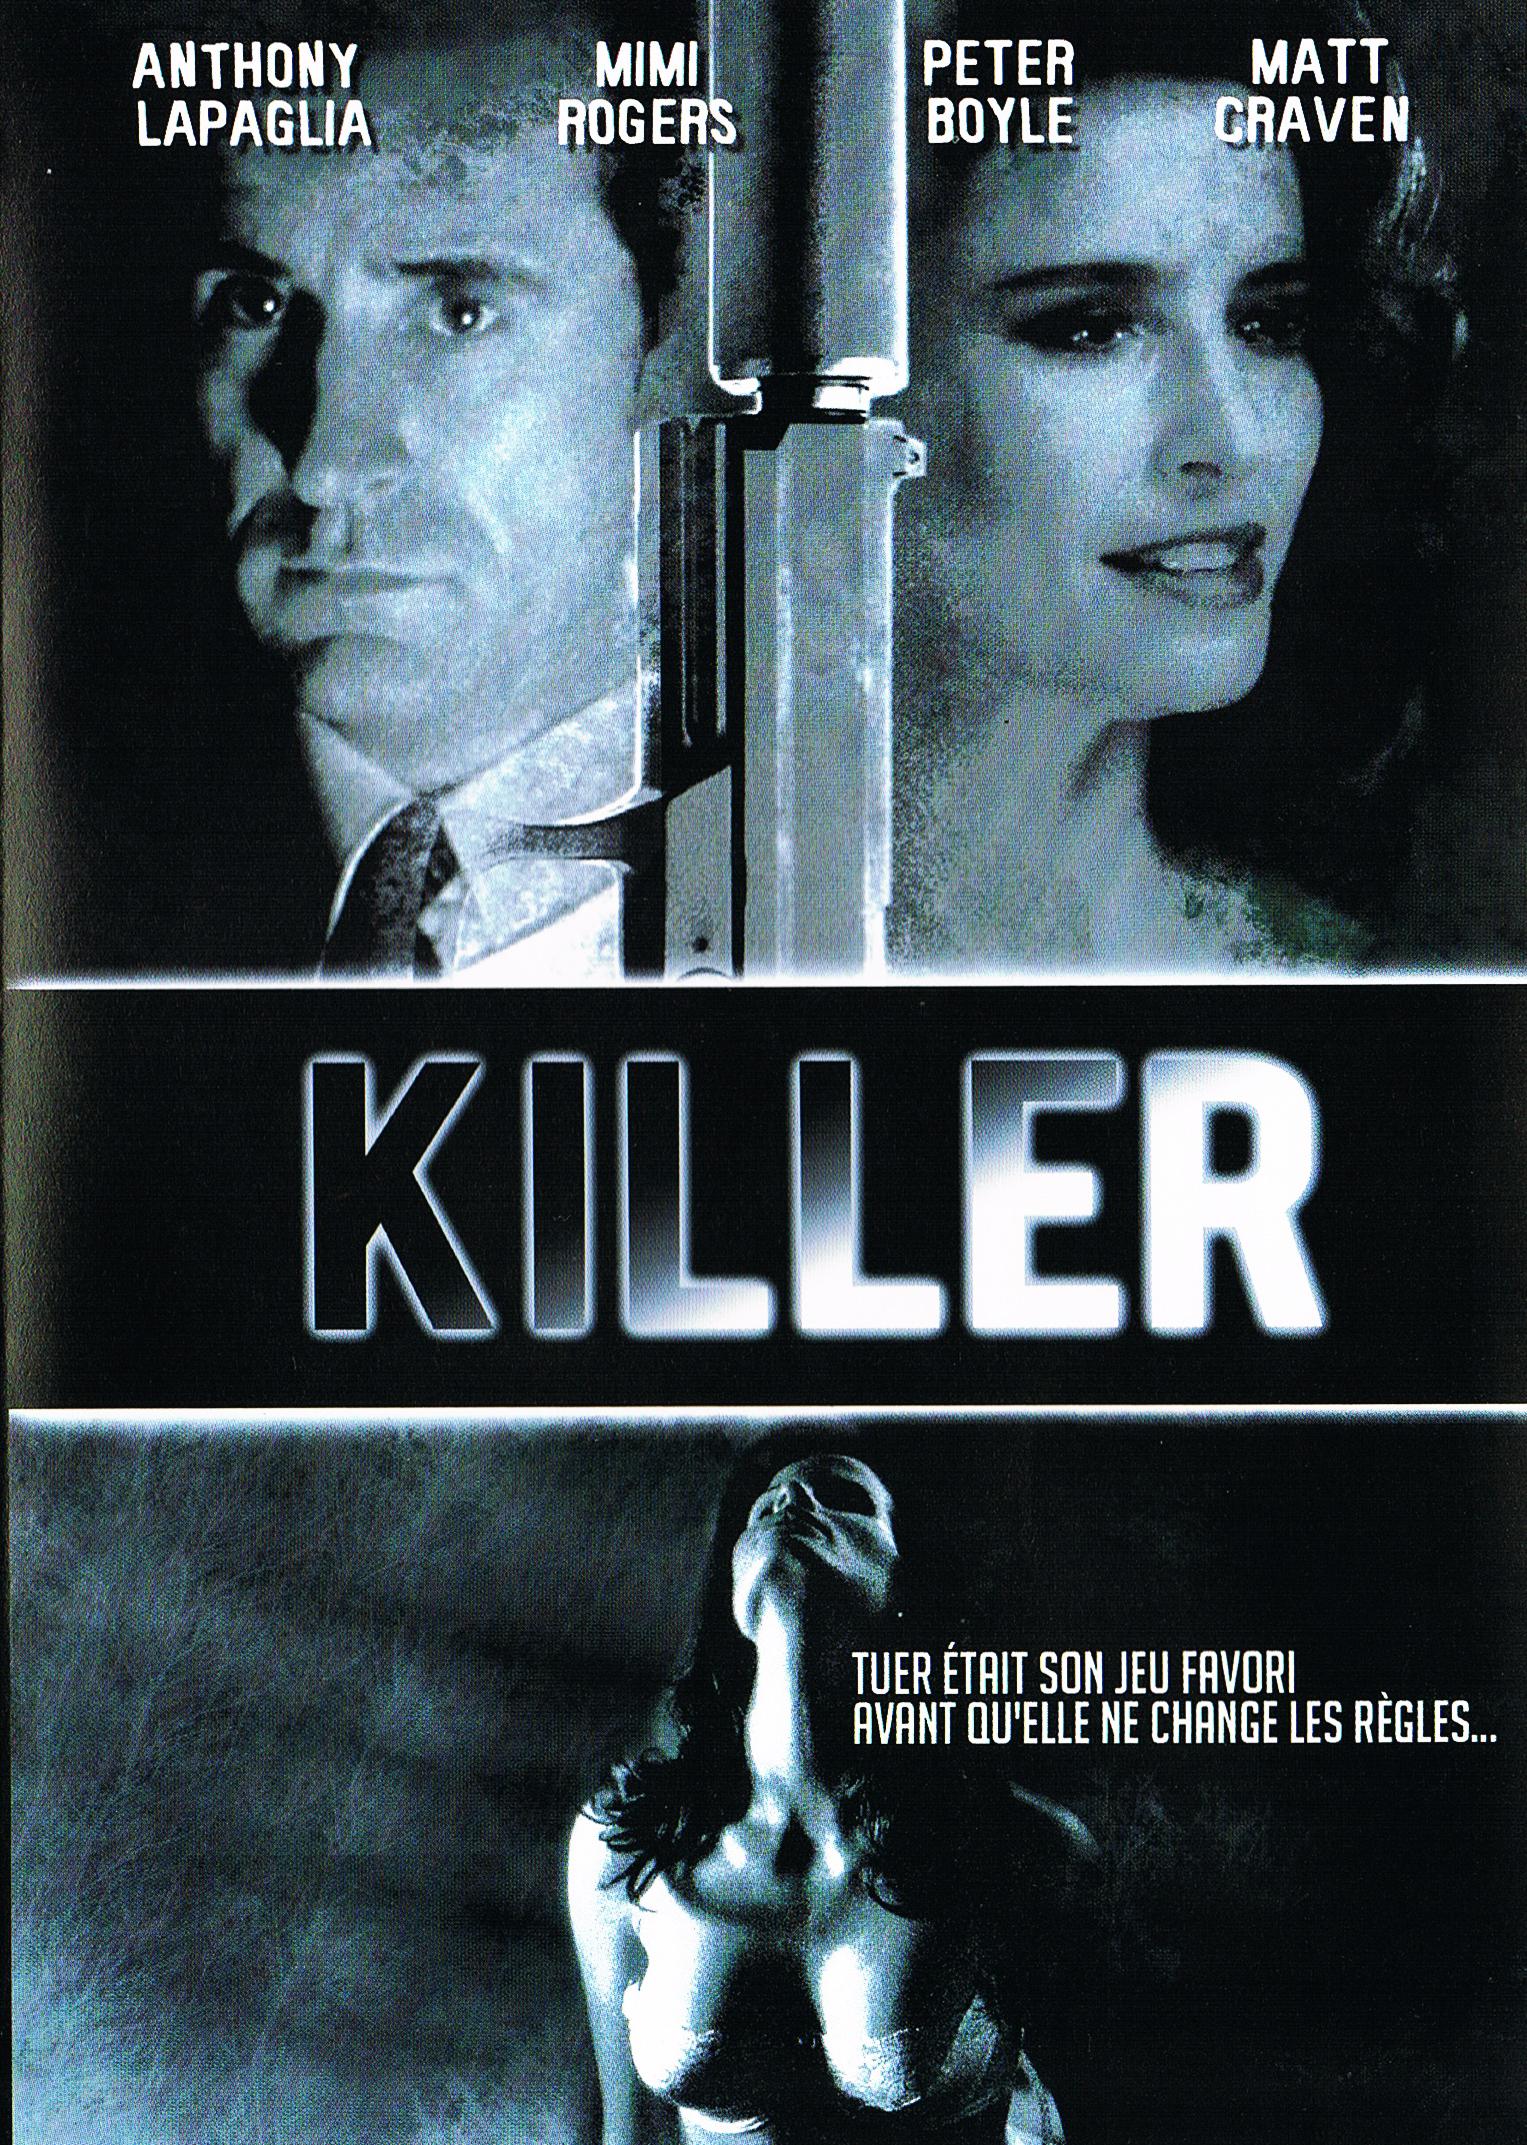 Киллер - Killer